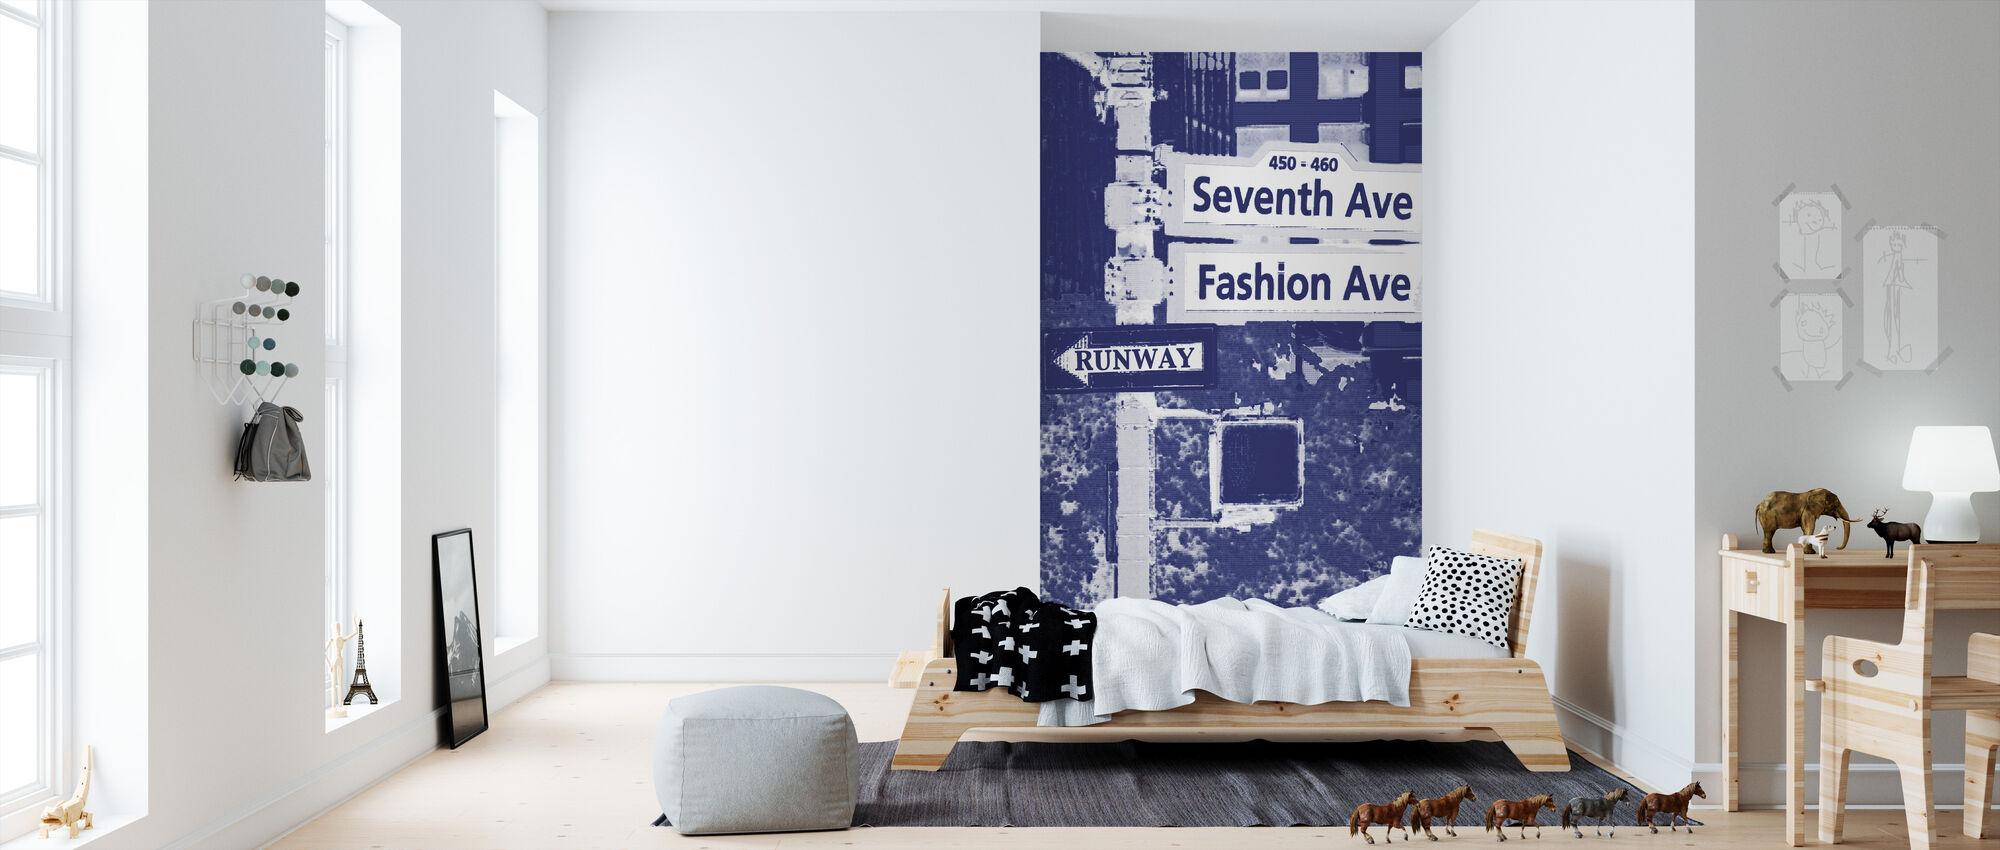 Fashion Ave - Behang - Kinderkamer